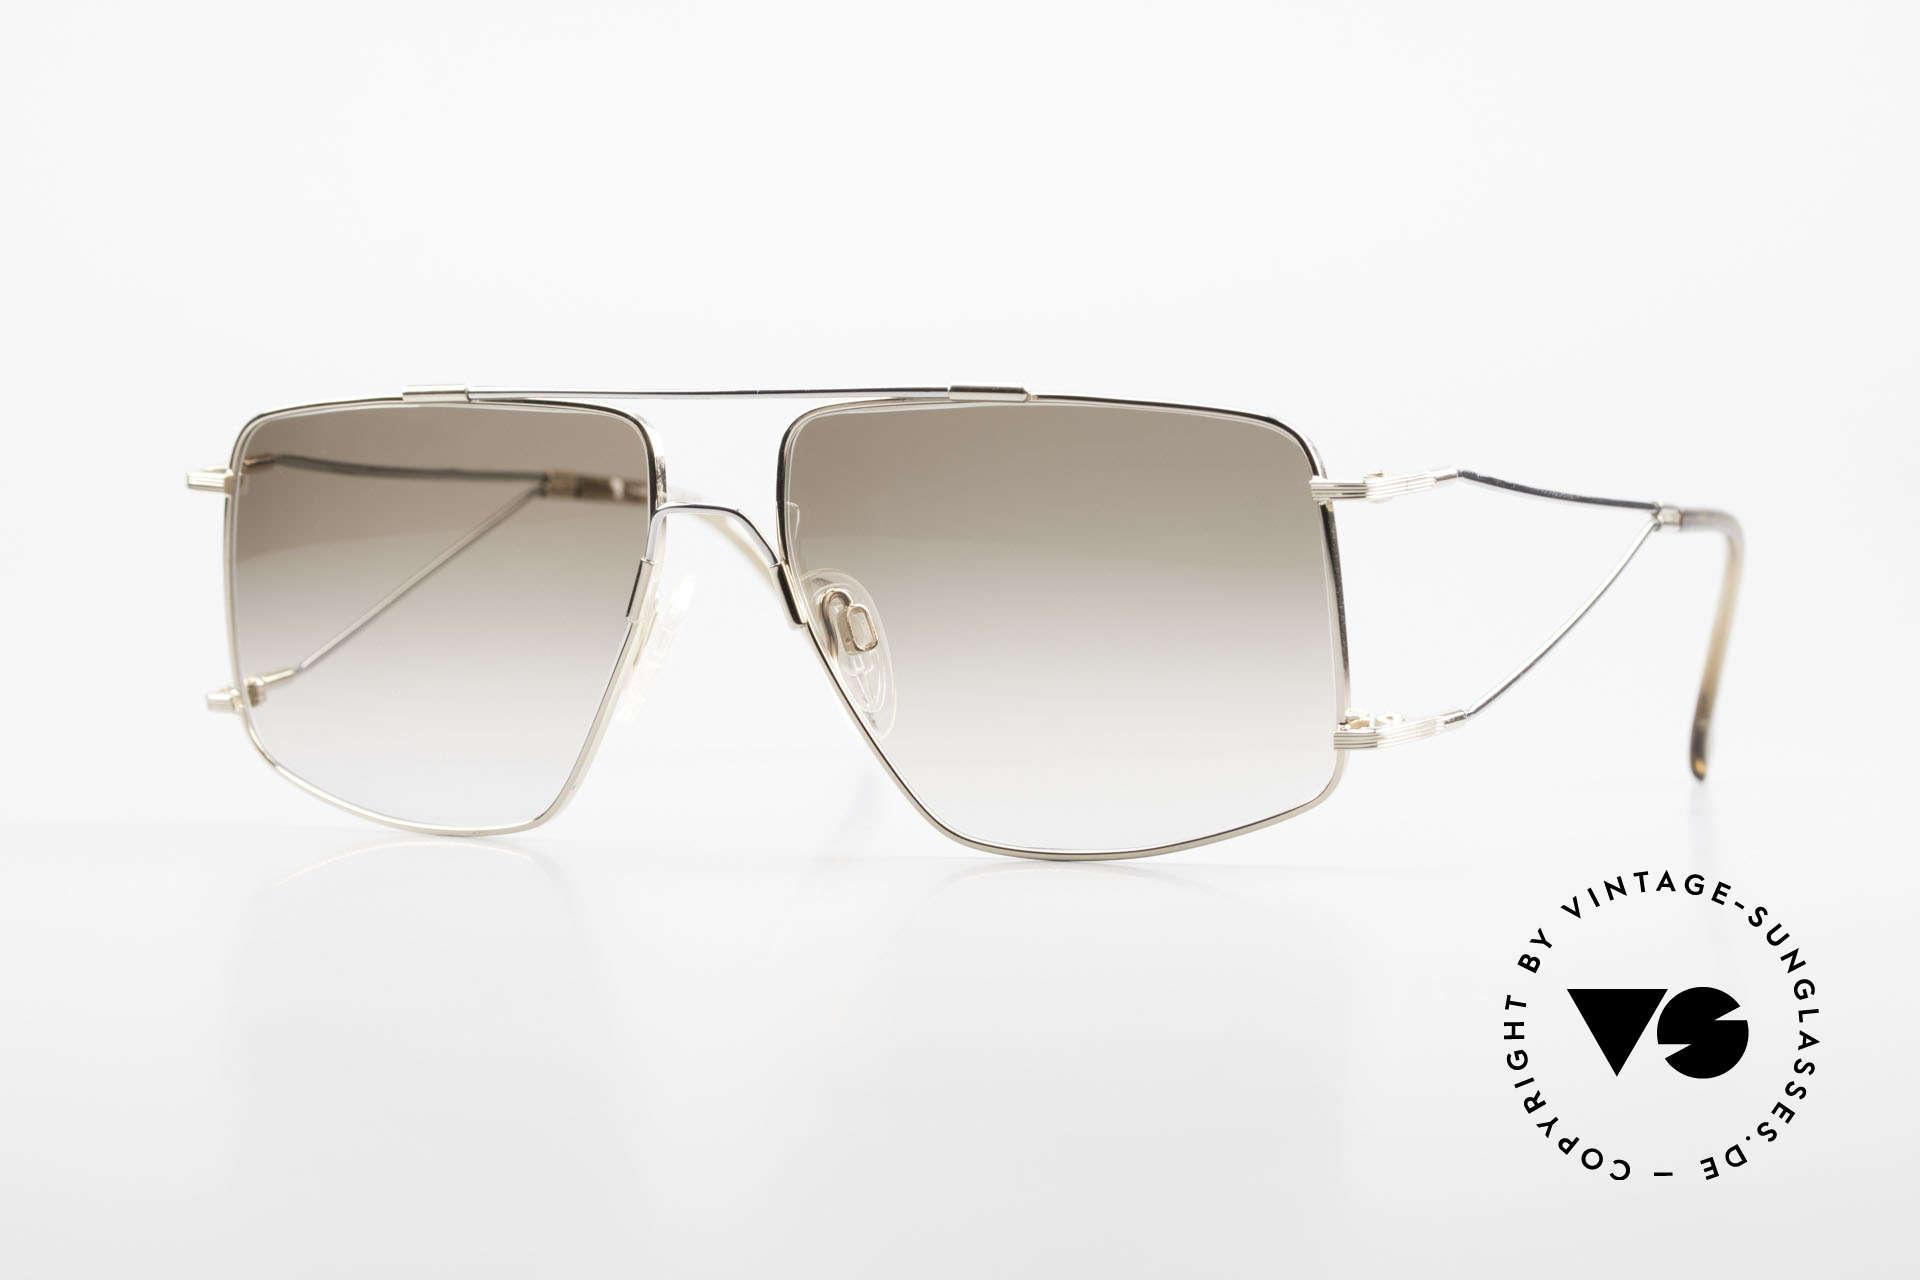 Neostyle Jet 40 Titanflex Vintage Sunglasses, sensational vintage NEOflex sunglasses by Neostyle, Made for Men